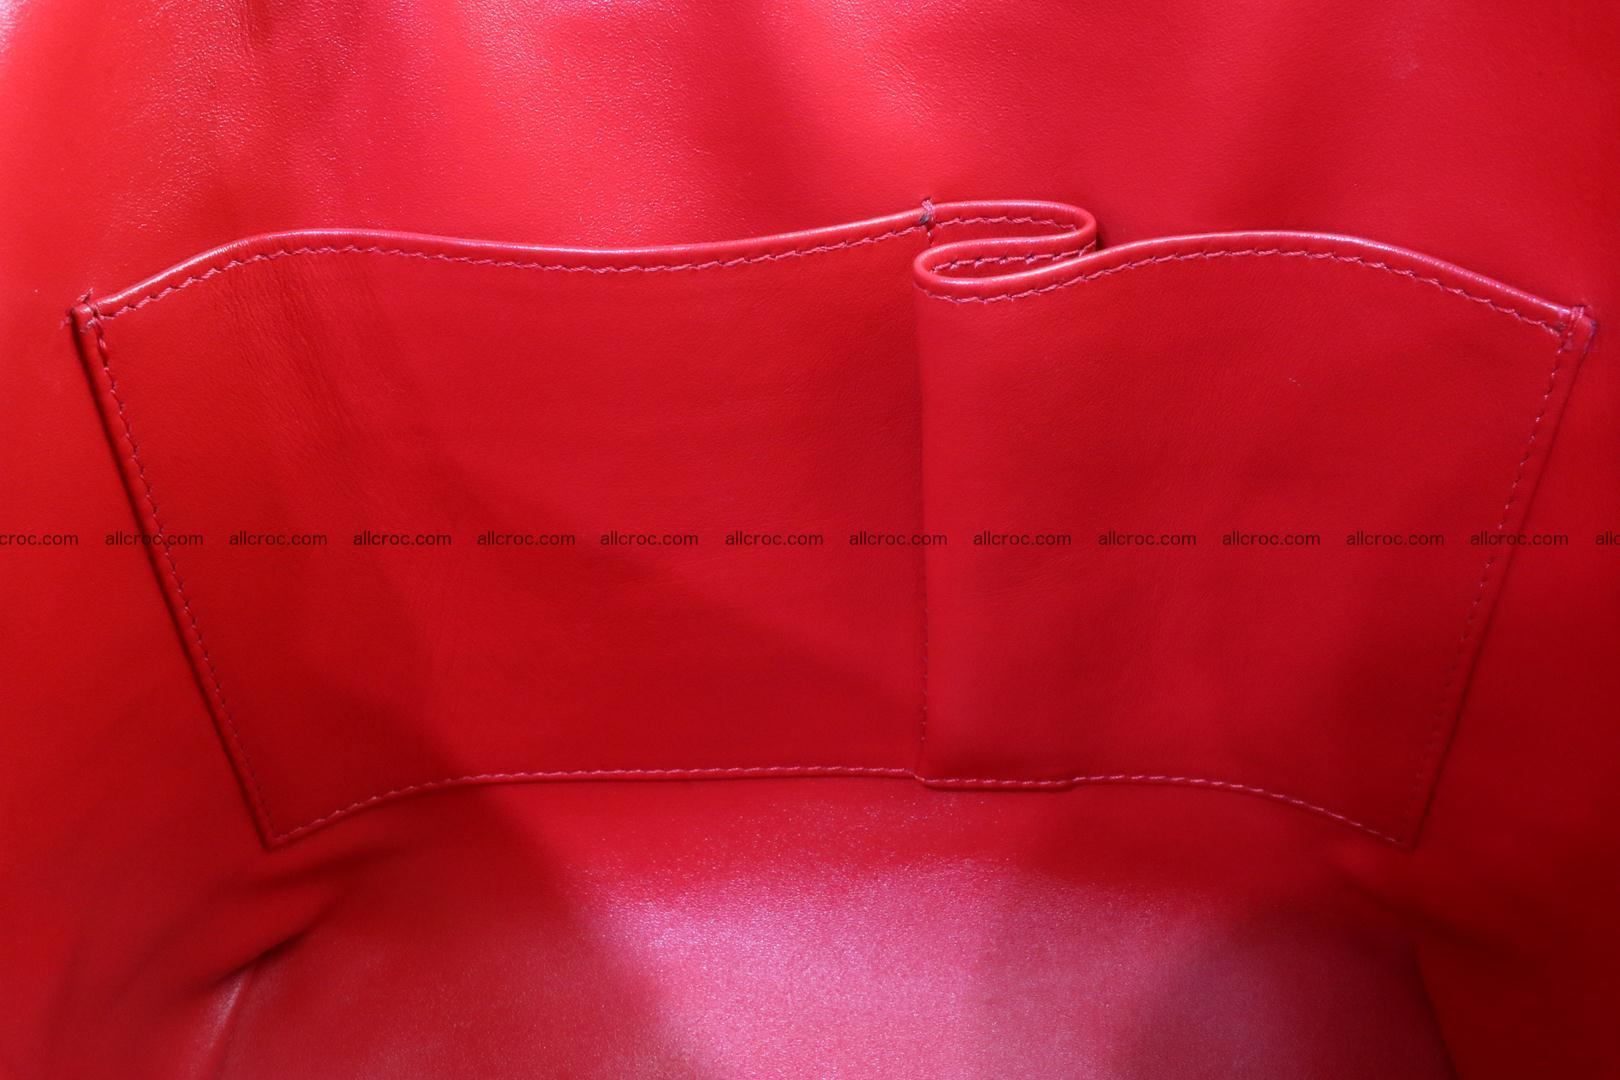 Genuine crocodile handbag for ladies 044 Foto 15